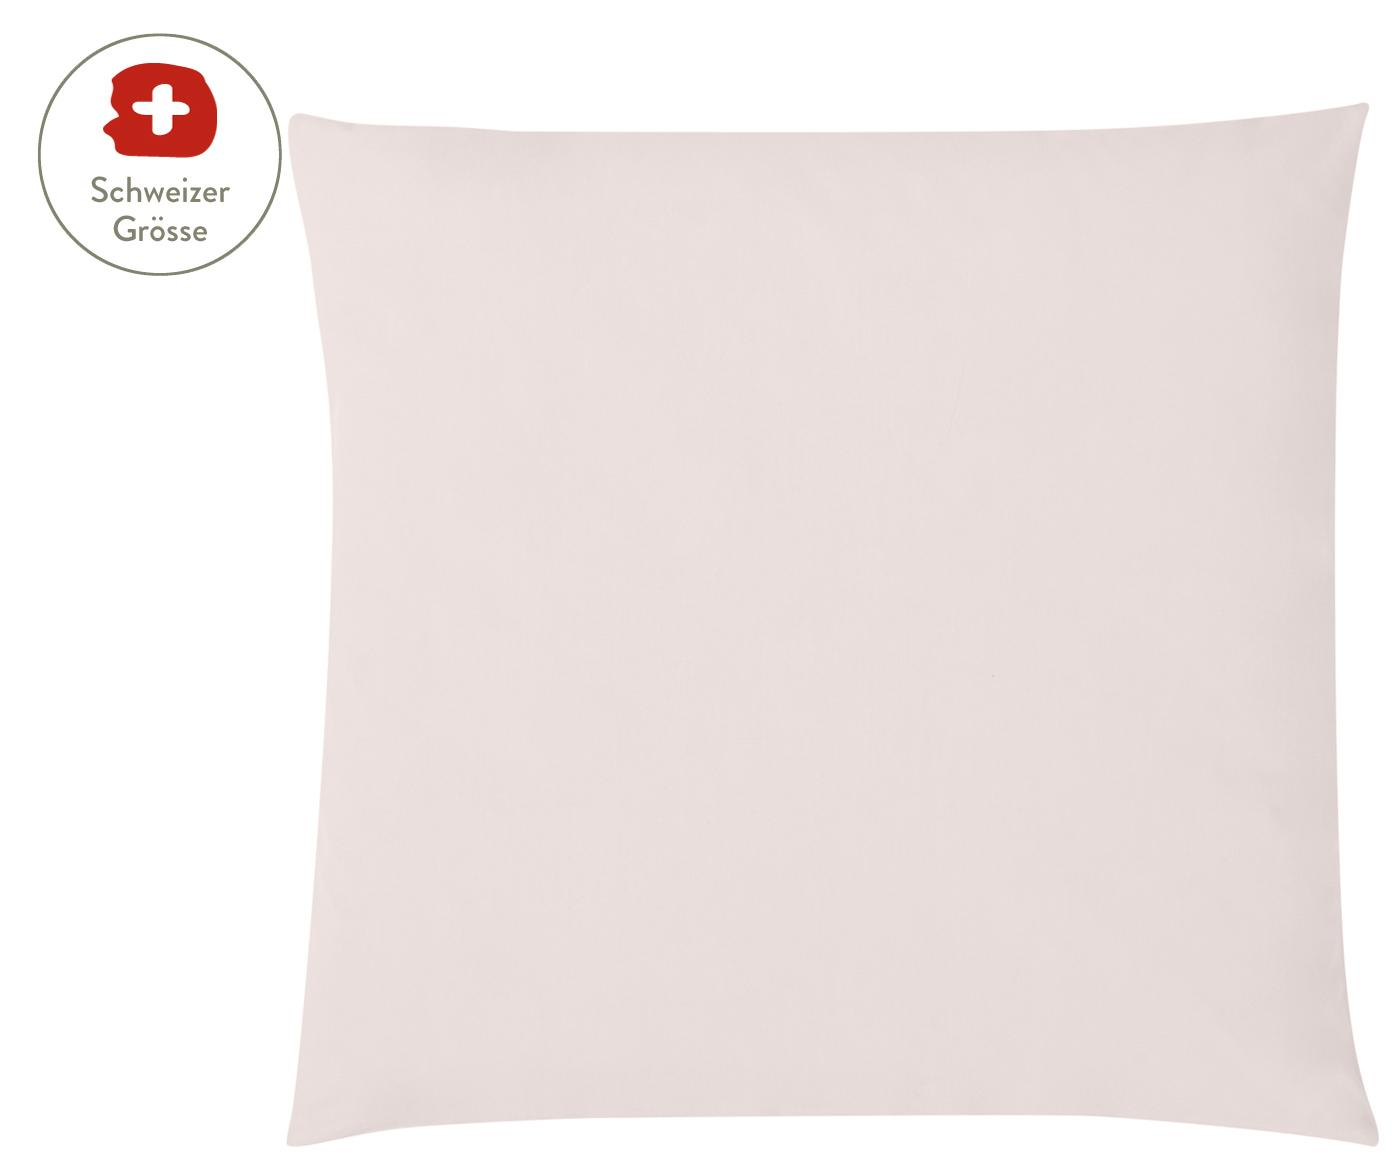 Baumwollperkal-Kissenbezug Elsie in Rosa, Webart: Perkal Fadendichte 200 TC, Rosa, 65 x 65 cm